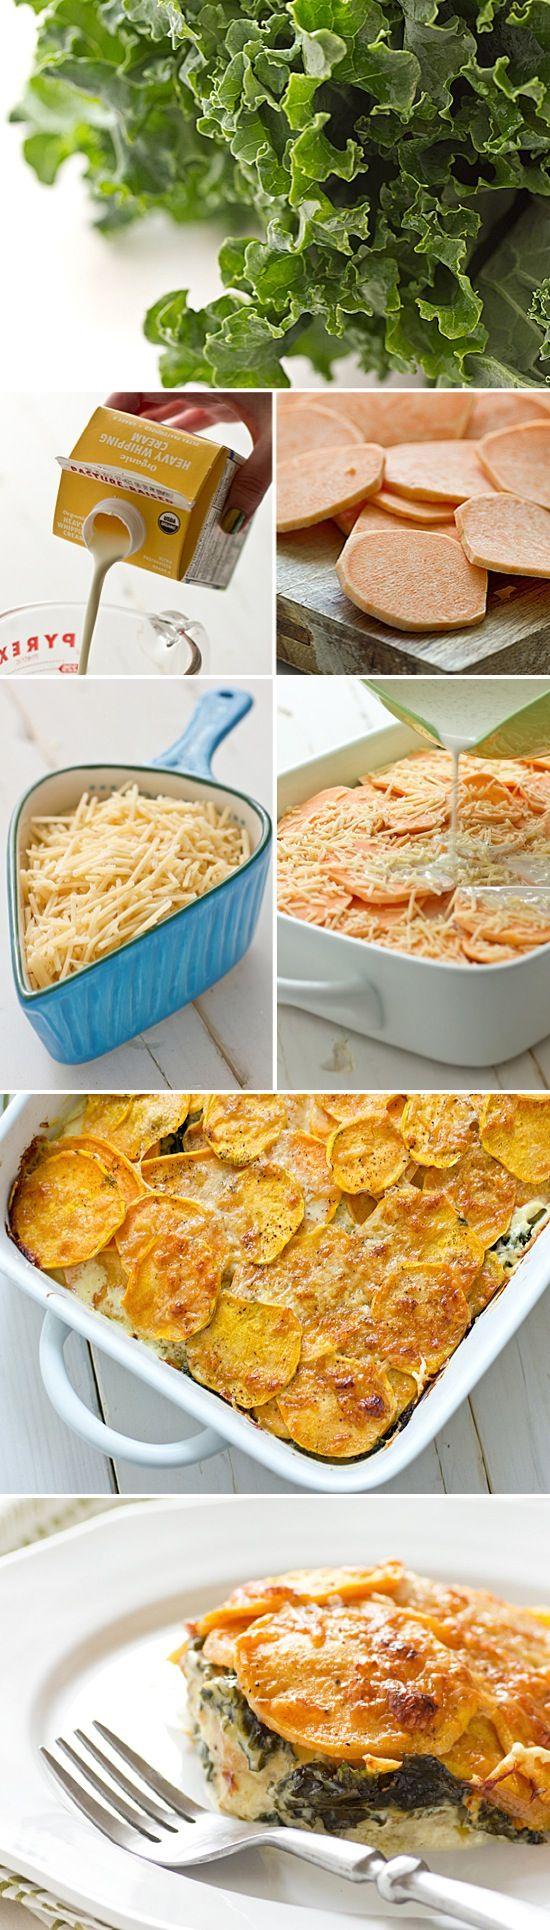 Sweet Potato & Kale Casserole | Recipe By Photo